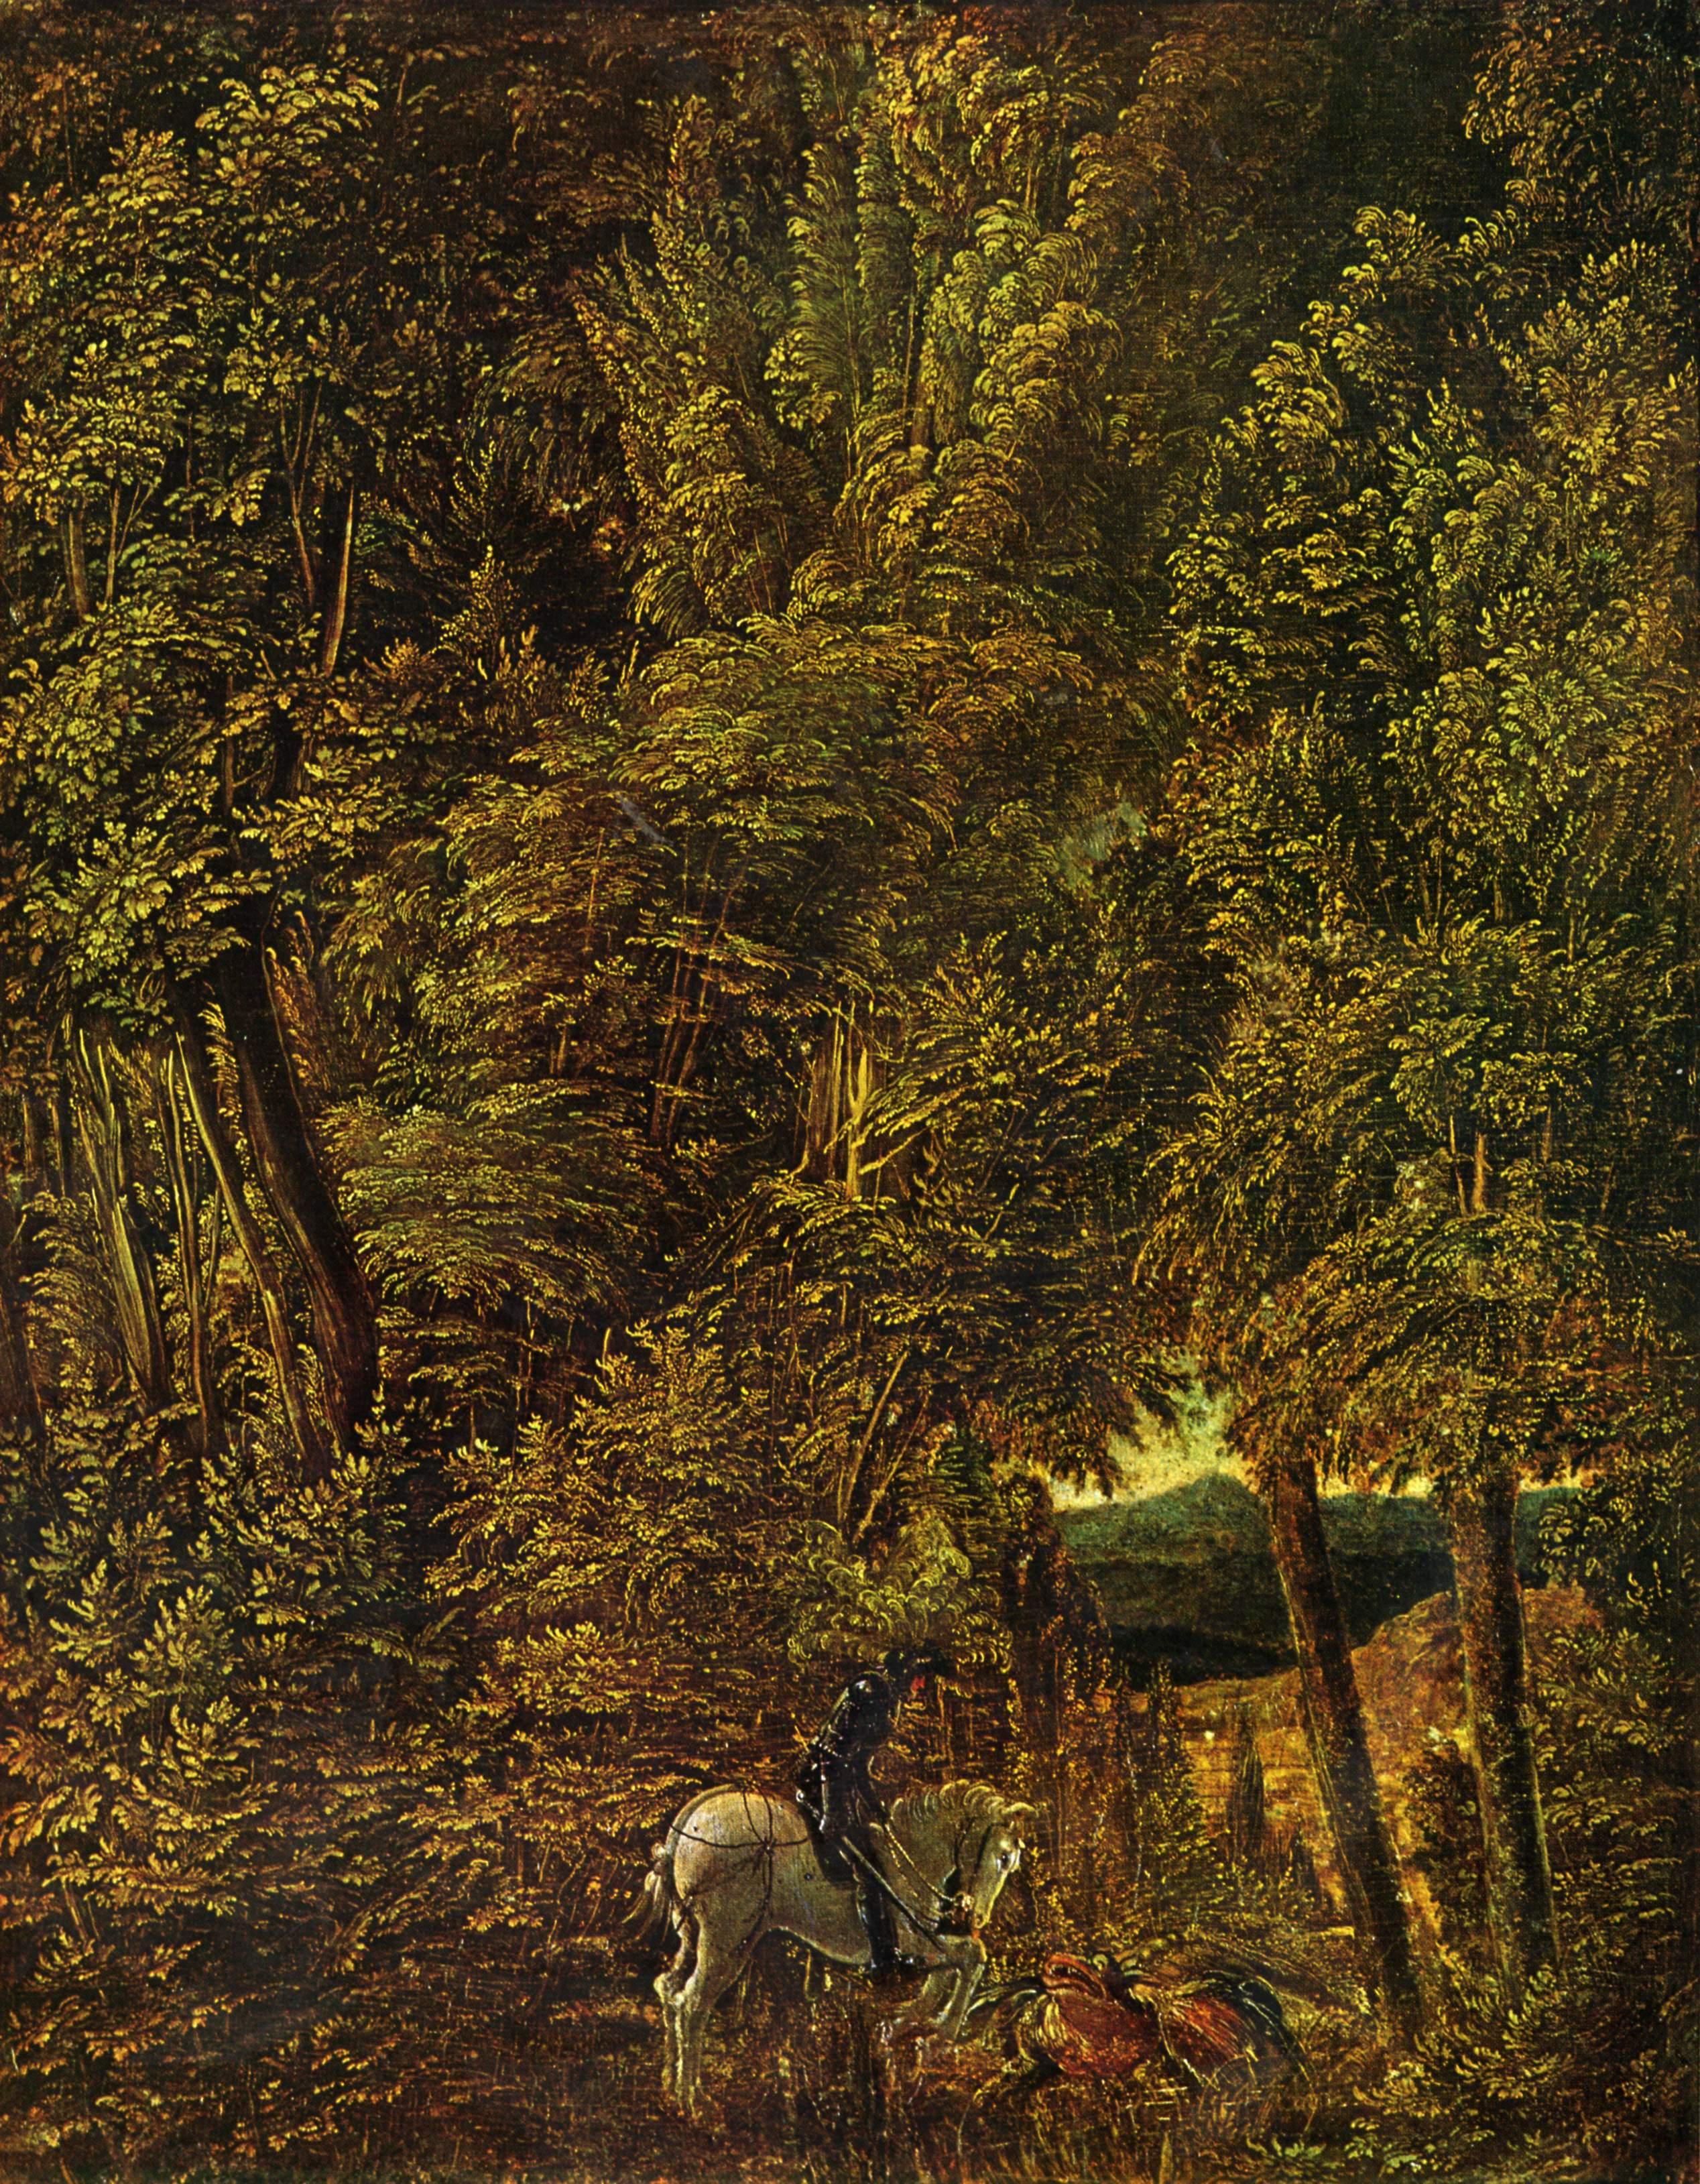 St. George in the Forest, 1510, Alte Pinakothek, Munich :: Albrecht Altdorfer - user art painting gallery ôîòî